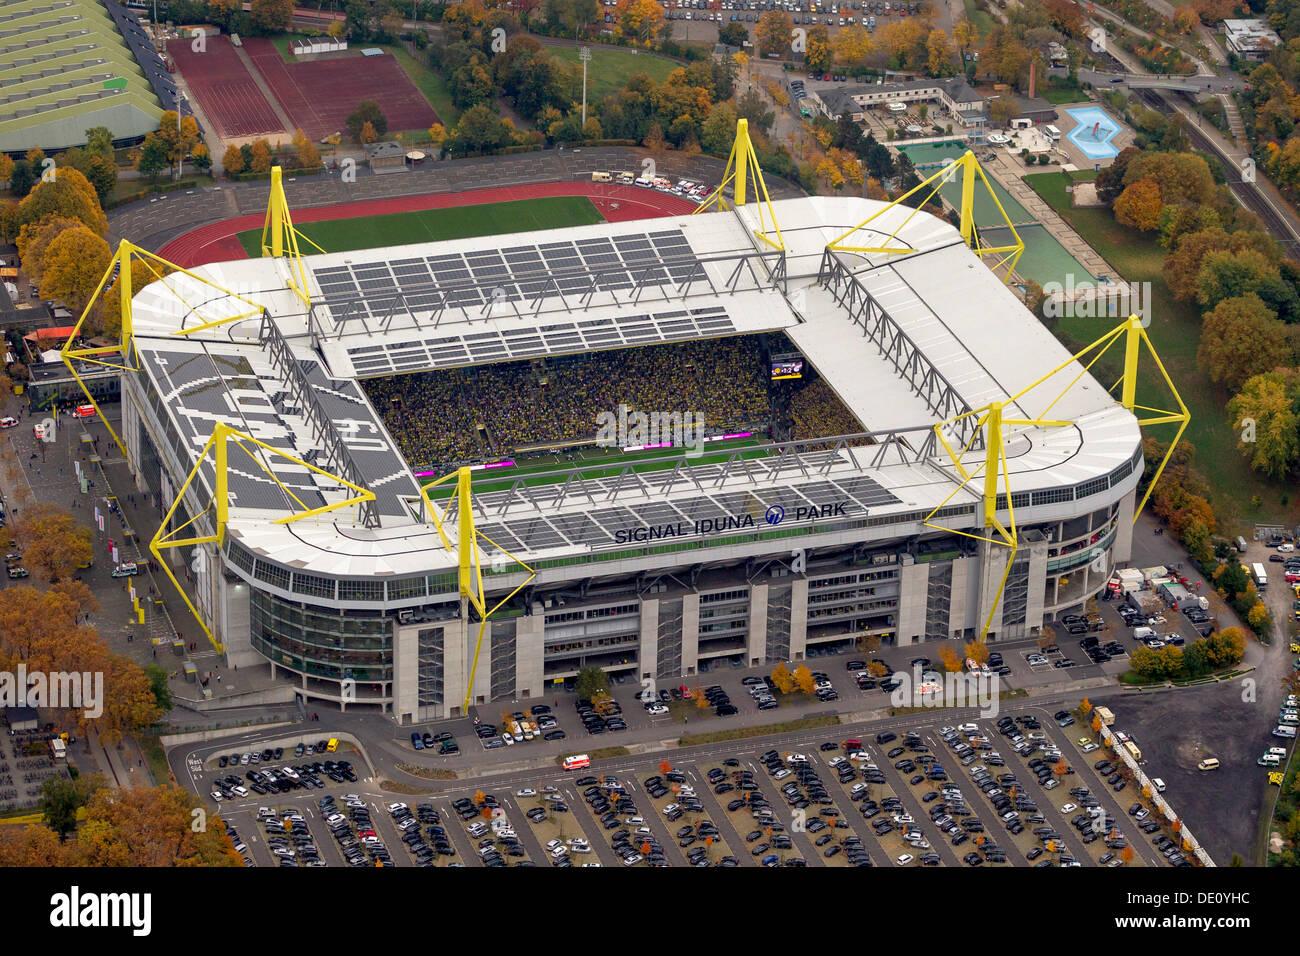 Autumn Fall Live Wallpaper Aerial View Signal Iduna Park Stadium Dortmund Ruhr